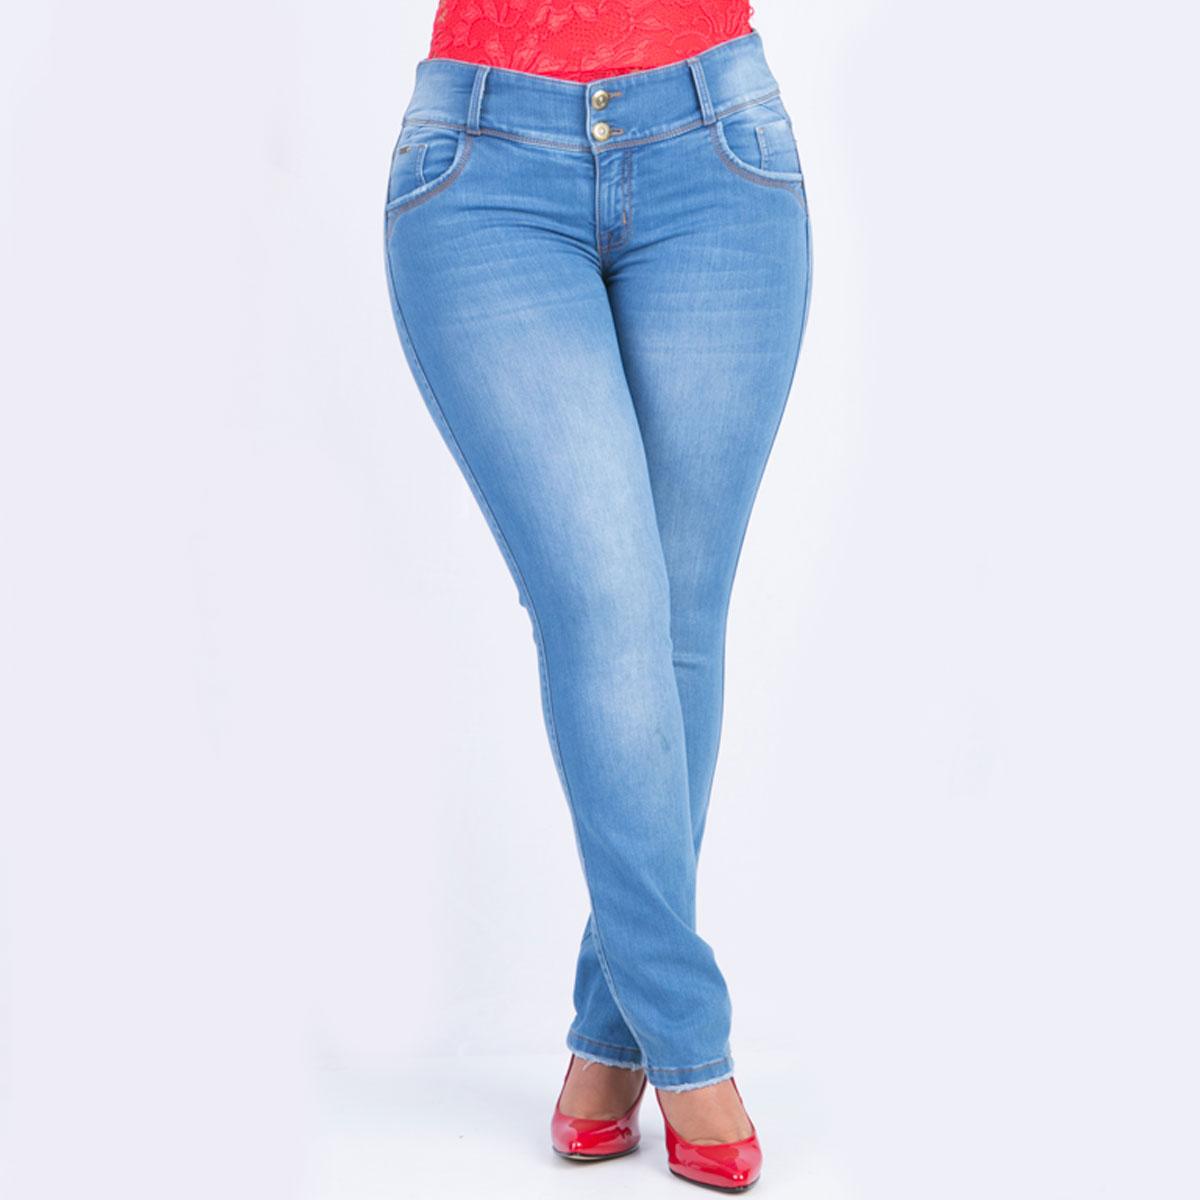 274d1ccc99 Jean bota recta para mujer big size Farichi Studio tiene una característica